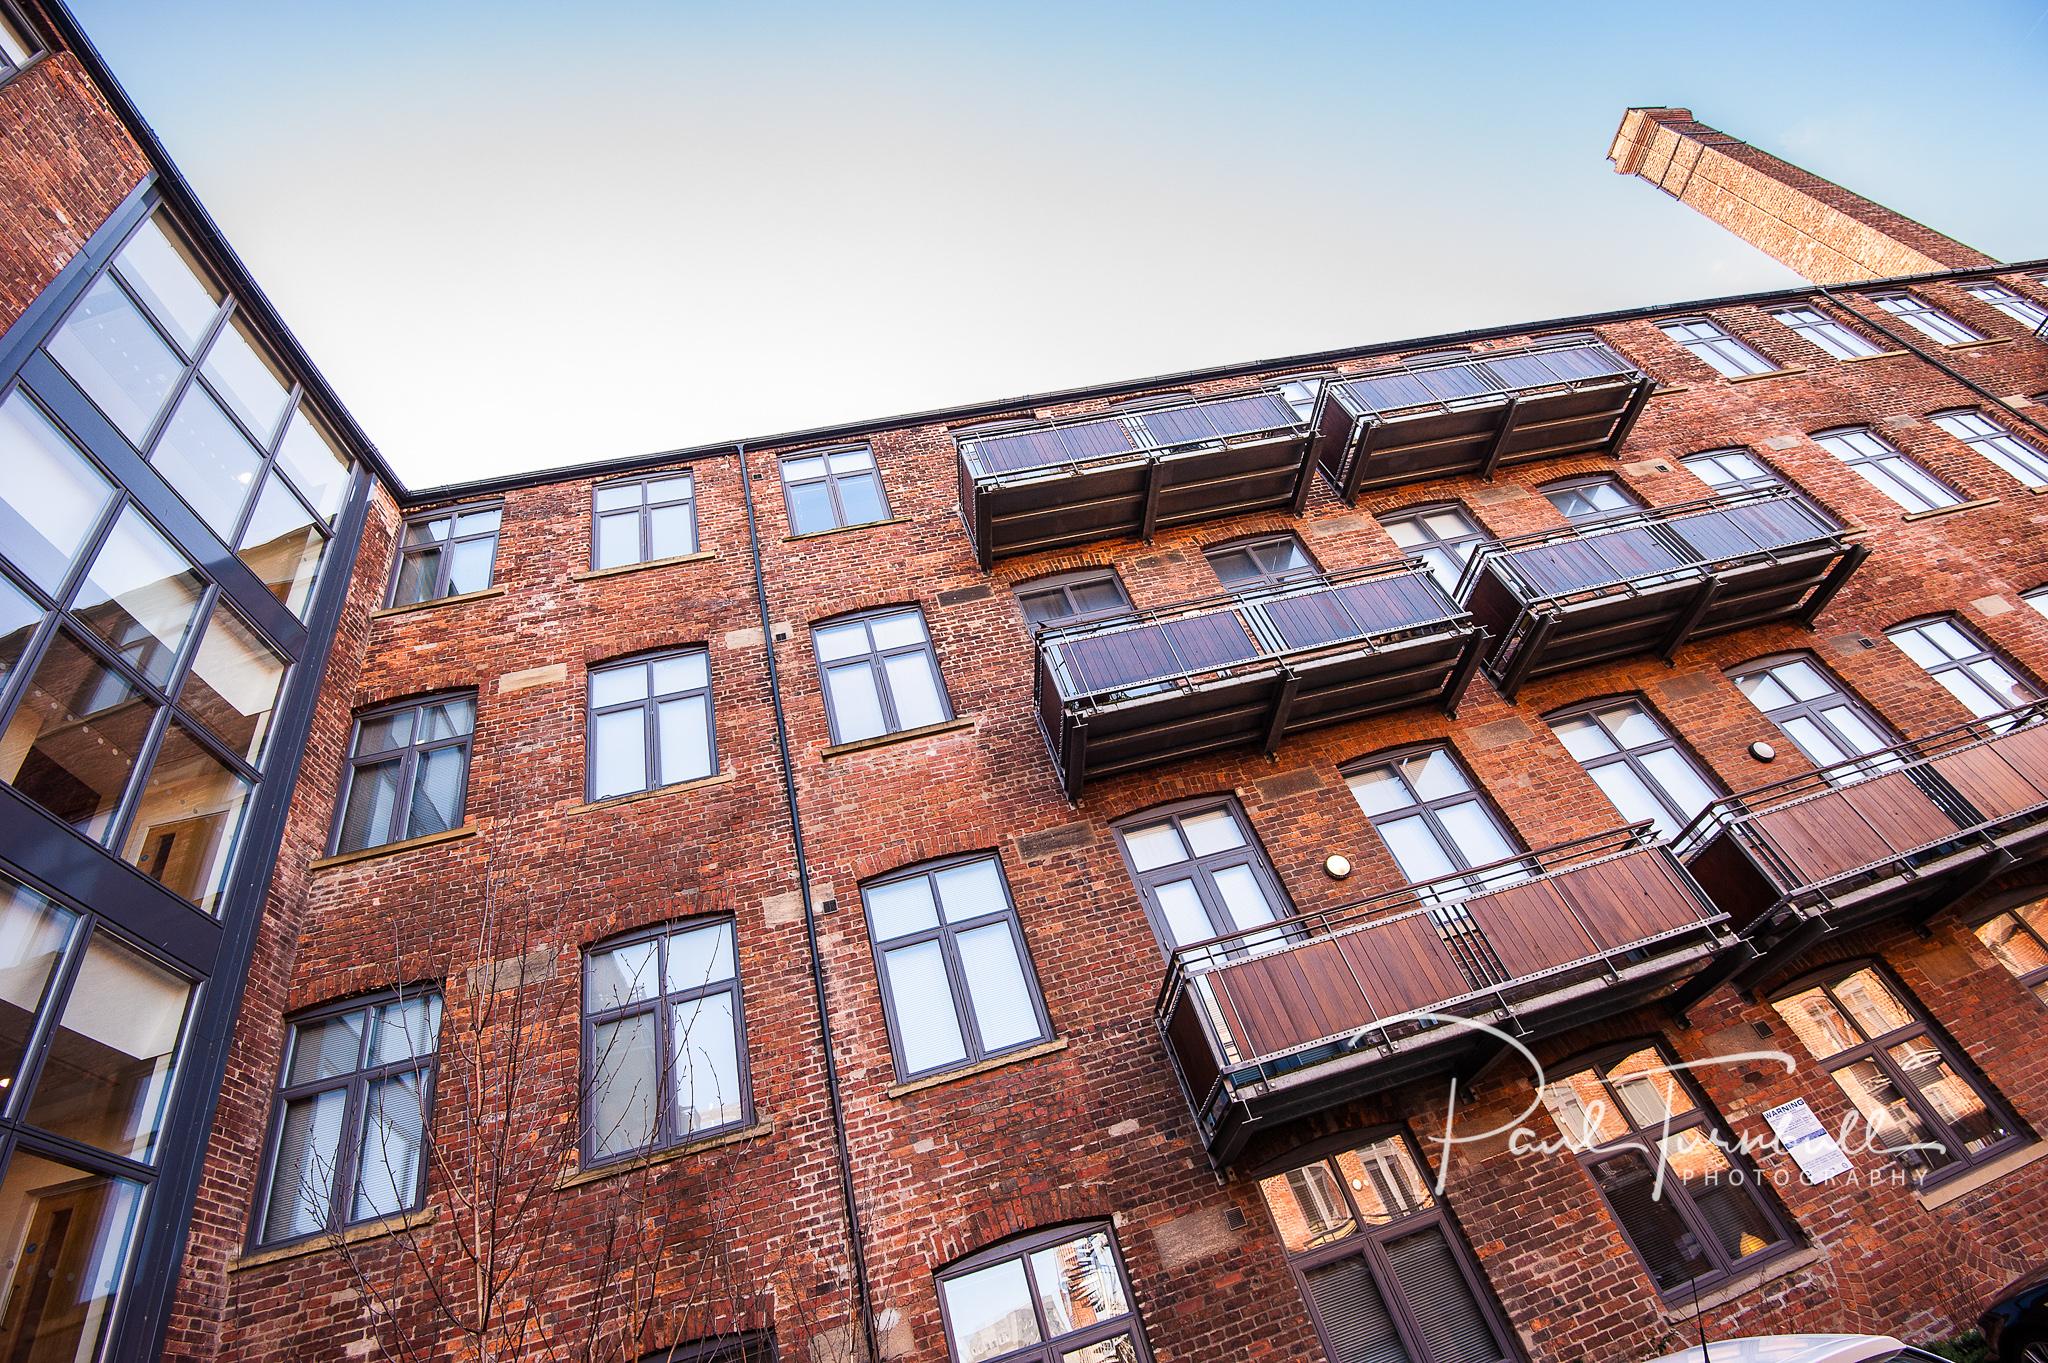 commercial-property-photographer-leeds-yorkshire-blackbrook-developments-006.jpg